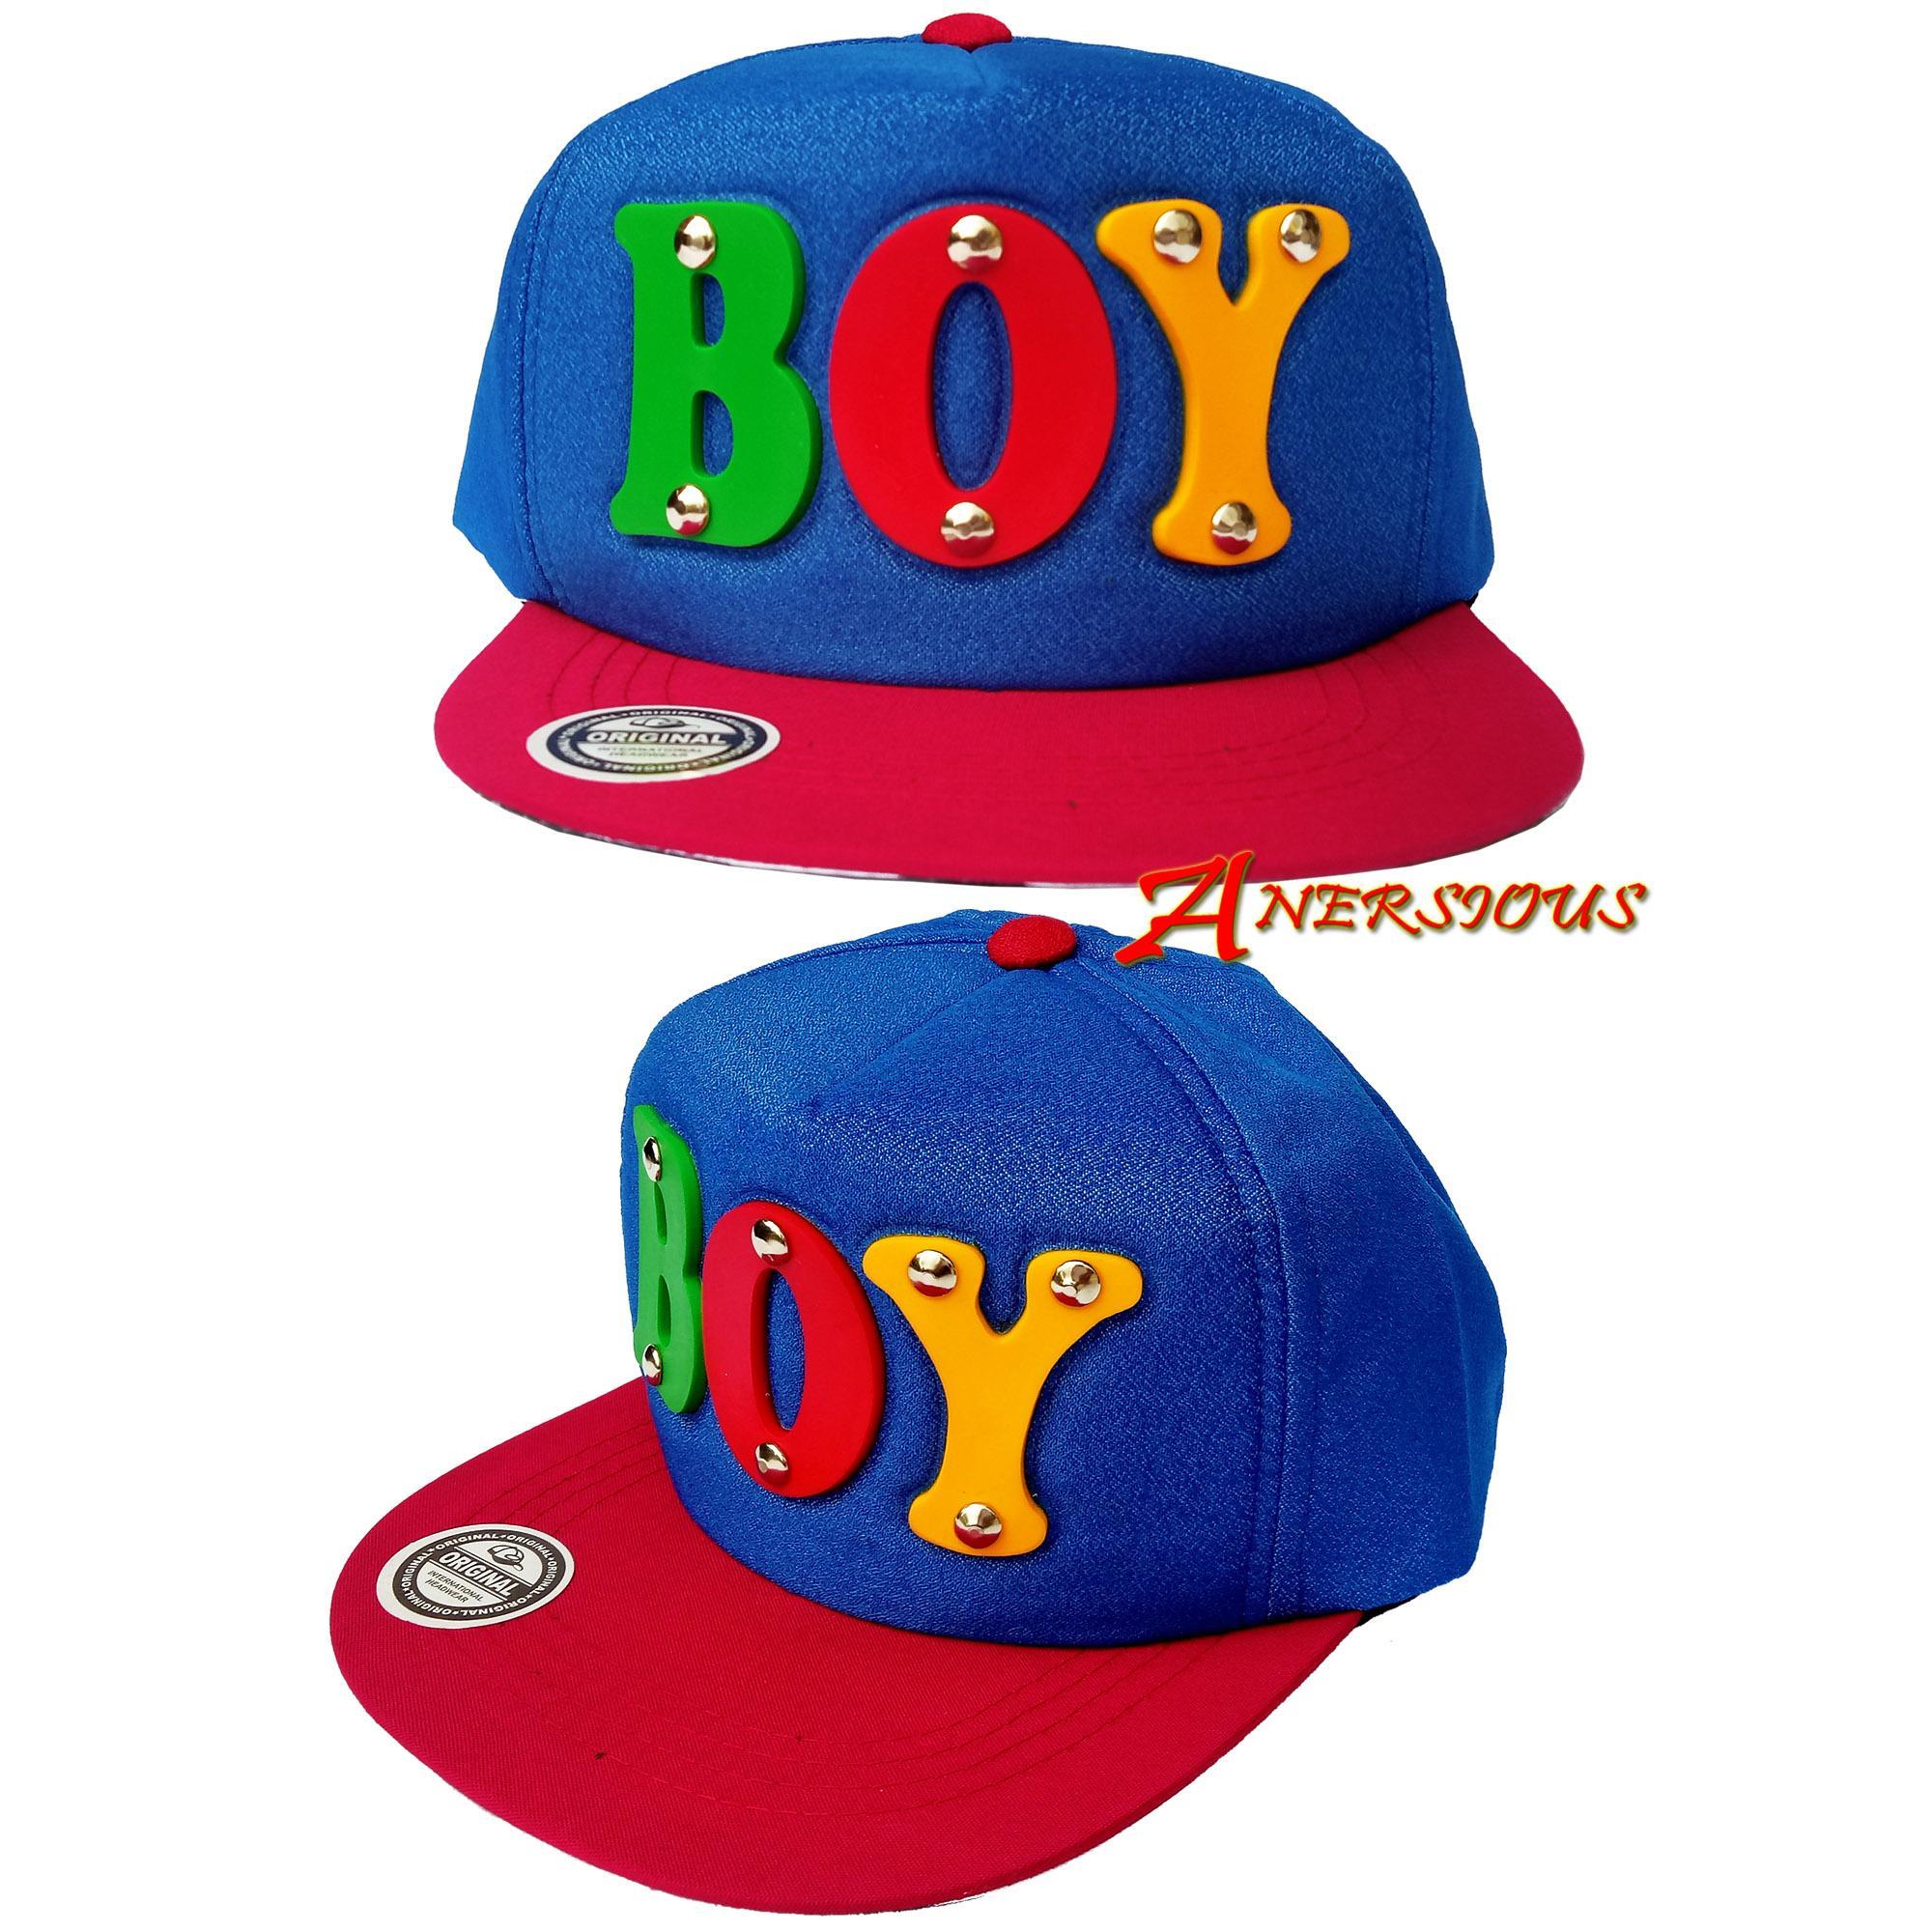 Topi Snapback Anak Model Paku Topi Dengan Desain Motif Keren Tulisan Timbul  Boy 4776bb1203